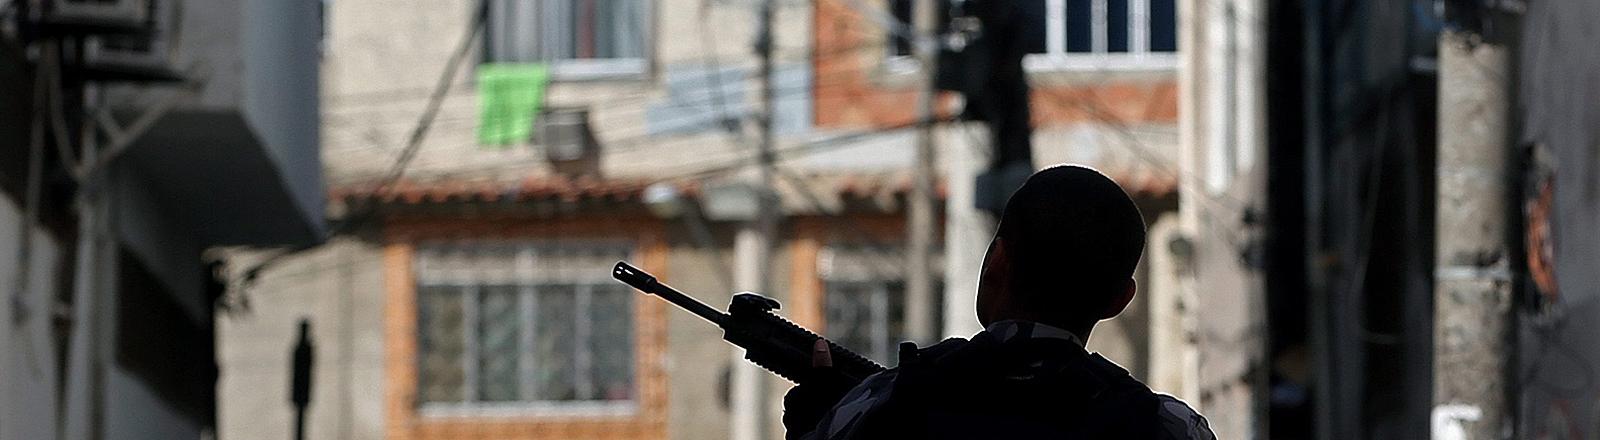 Polizist in Favela in Rio de Janeiro 2016